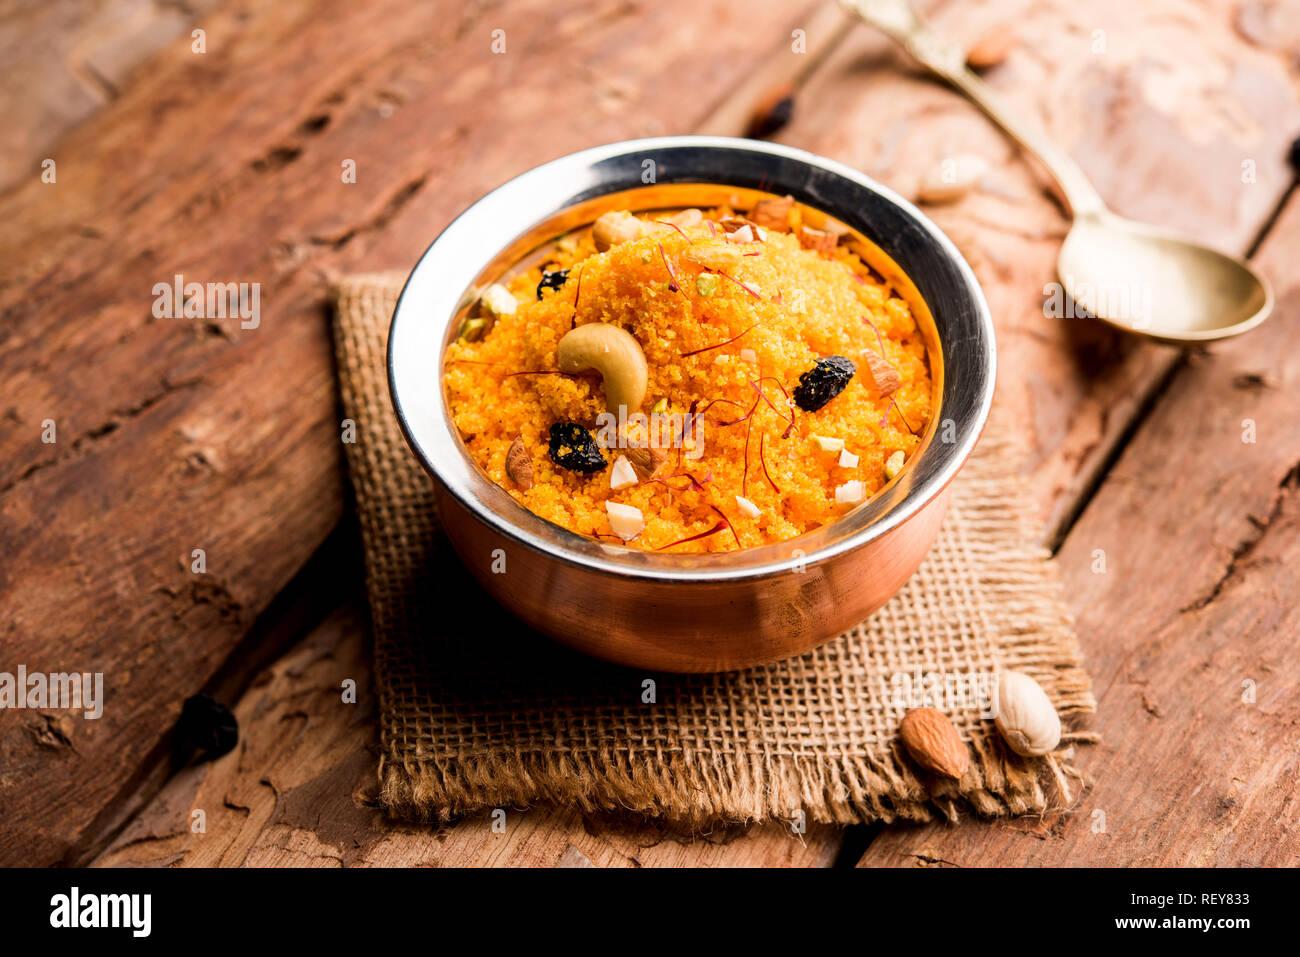 Badaam kesar shira / Sheera or almond saffron halwa, popular Indian dessert served in a bowl. selective focus - Stock Image